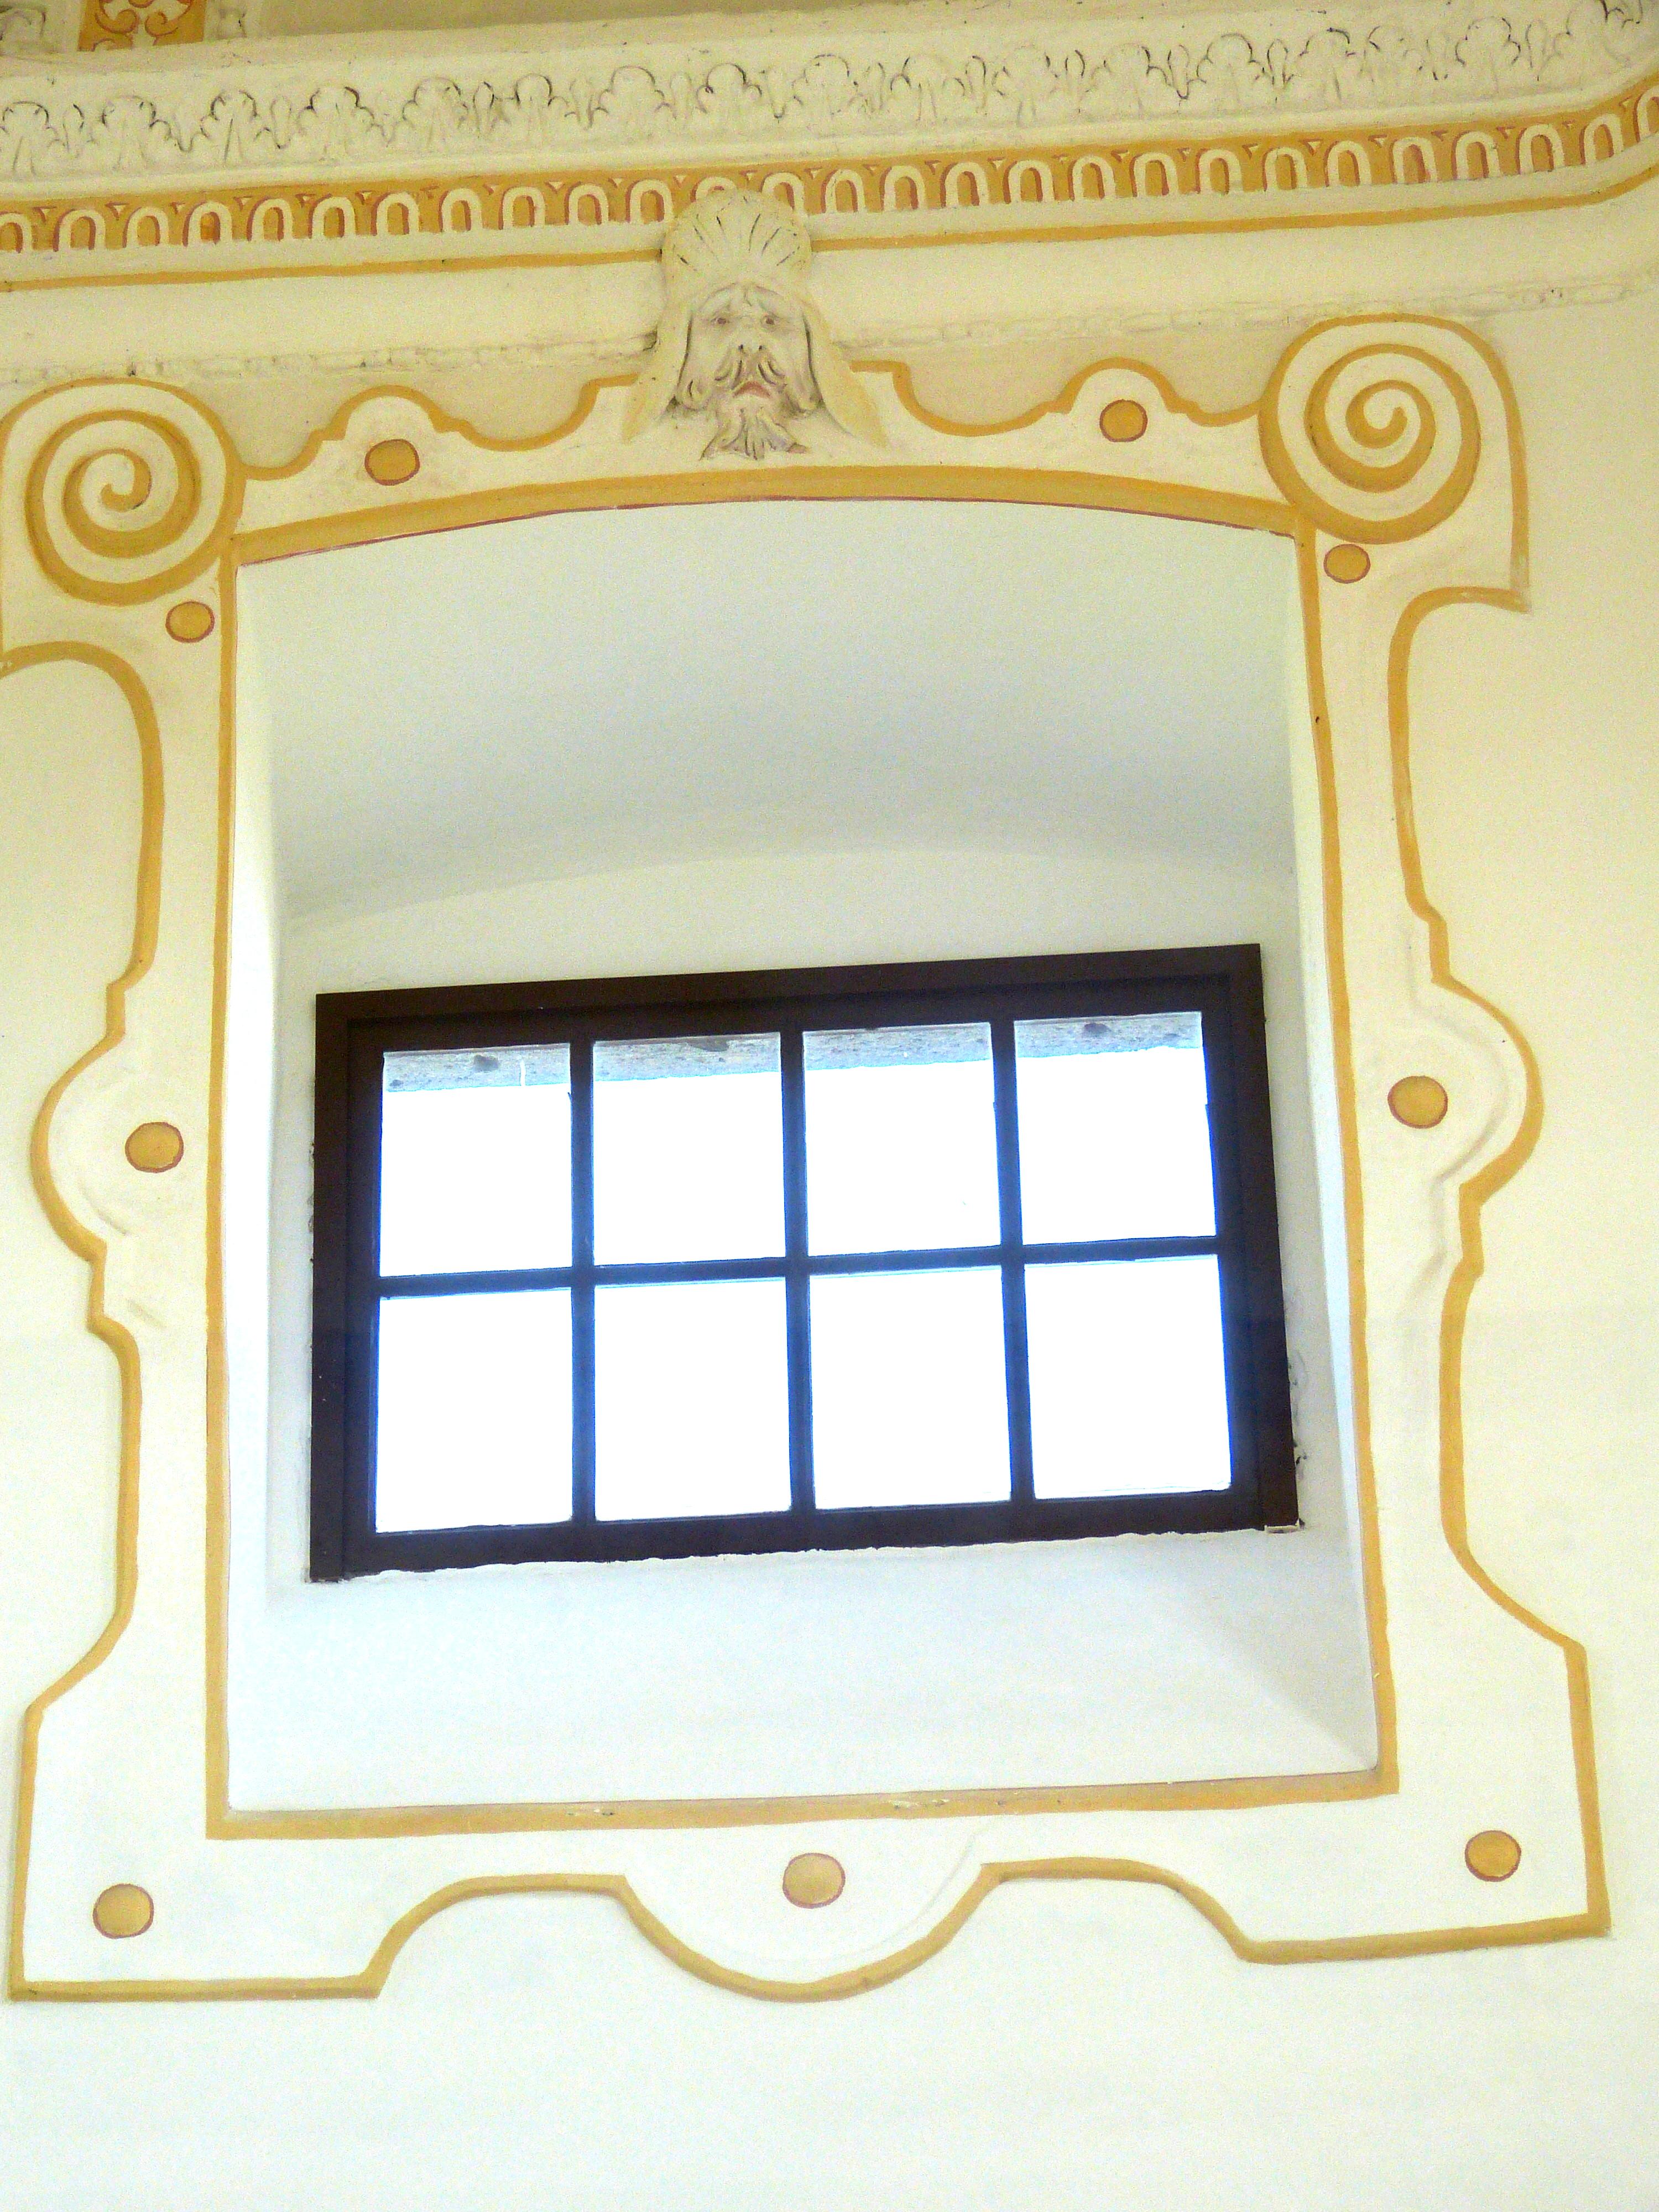 Innenraumfenster  File:Stift Kremsmünster - Moschee 4b Innenraum Fenster.jpg ...